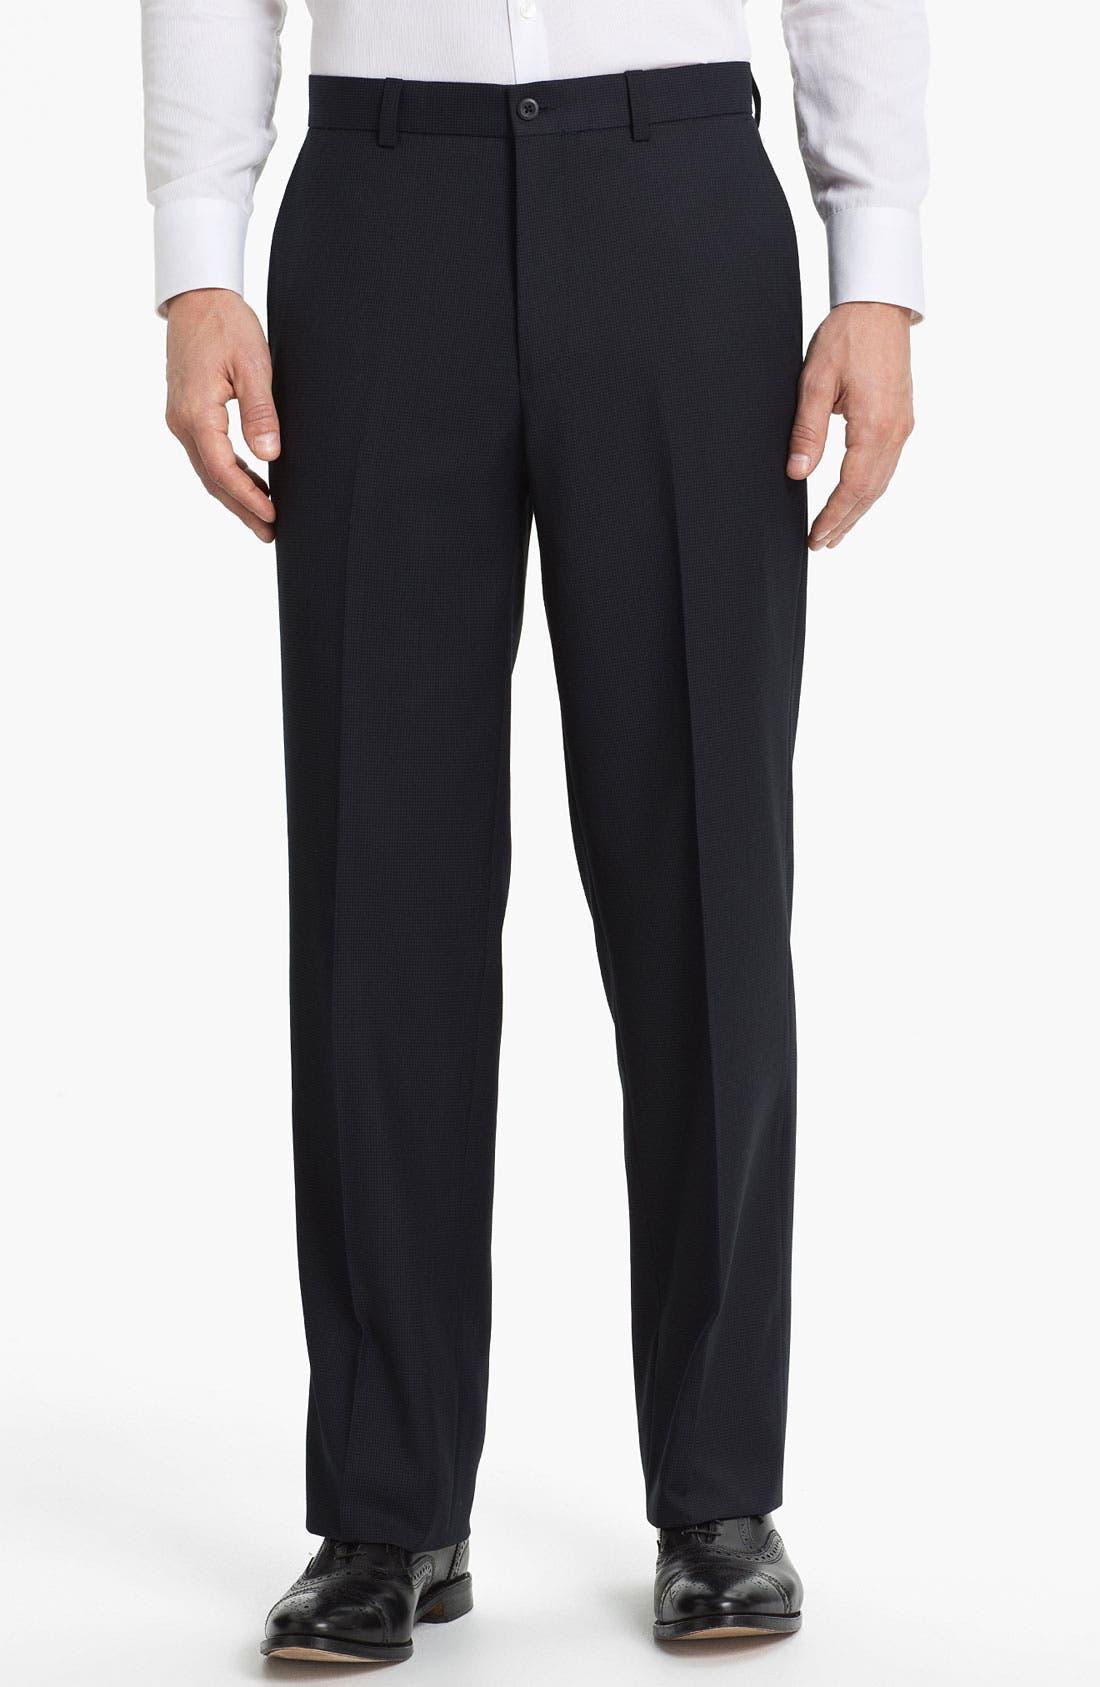 Main Image - Linea Naturale 'Fancy' Flat Front Microfiber Trousers